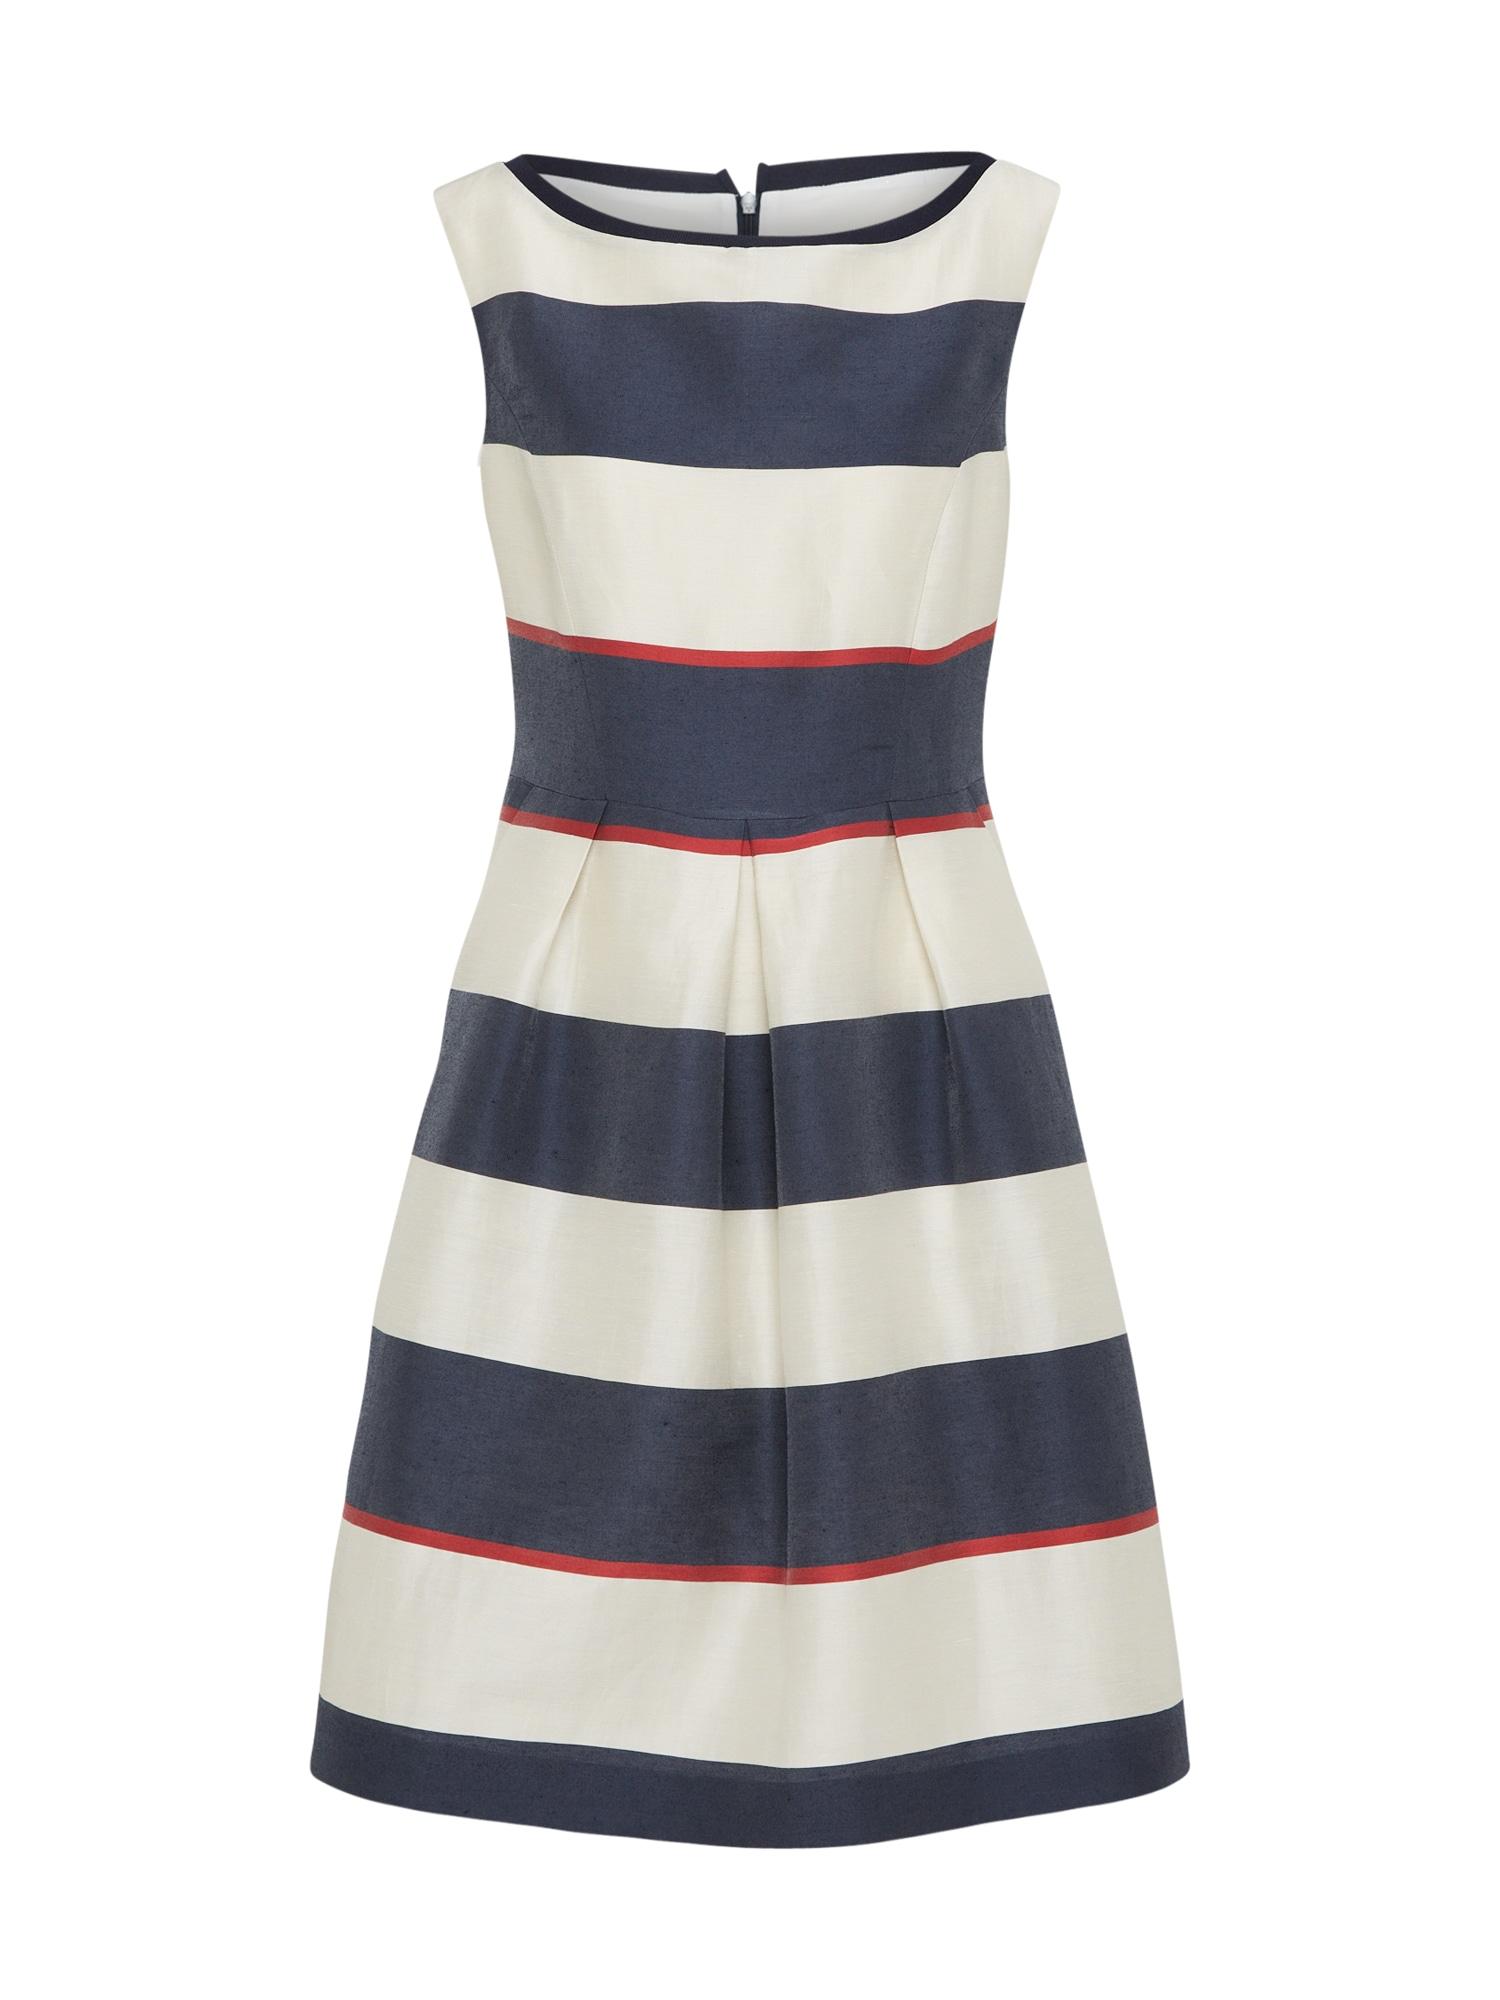 Koktejlové šaty námořnická modř bílá RENÉ LEZARD